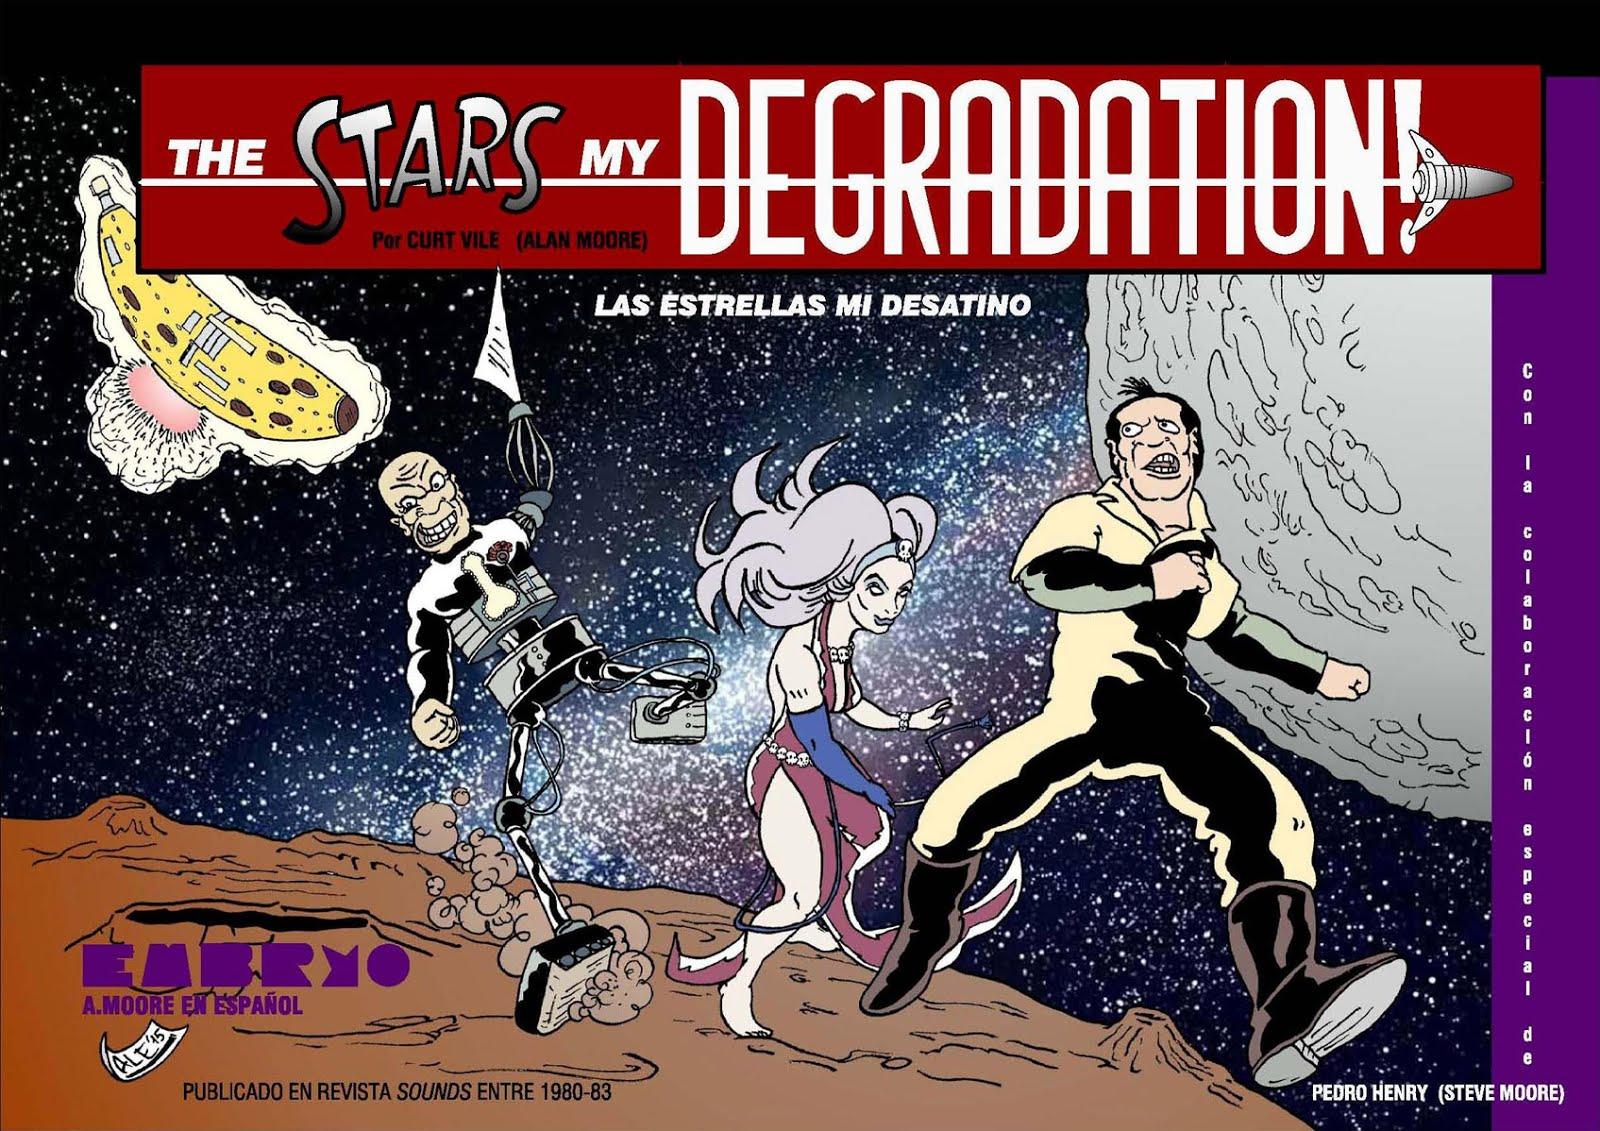 THE STARS MY DEGRADATION